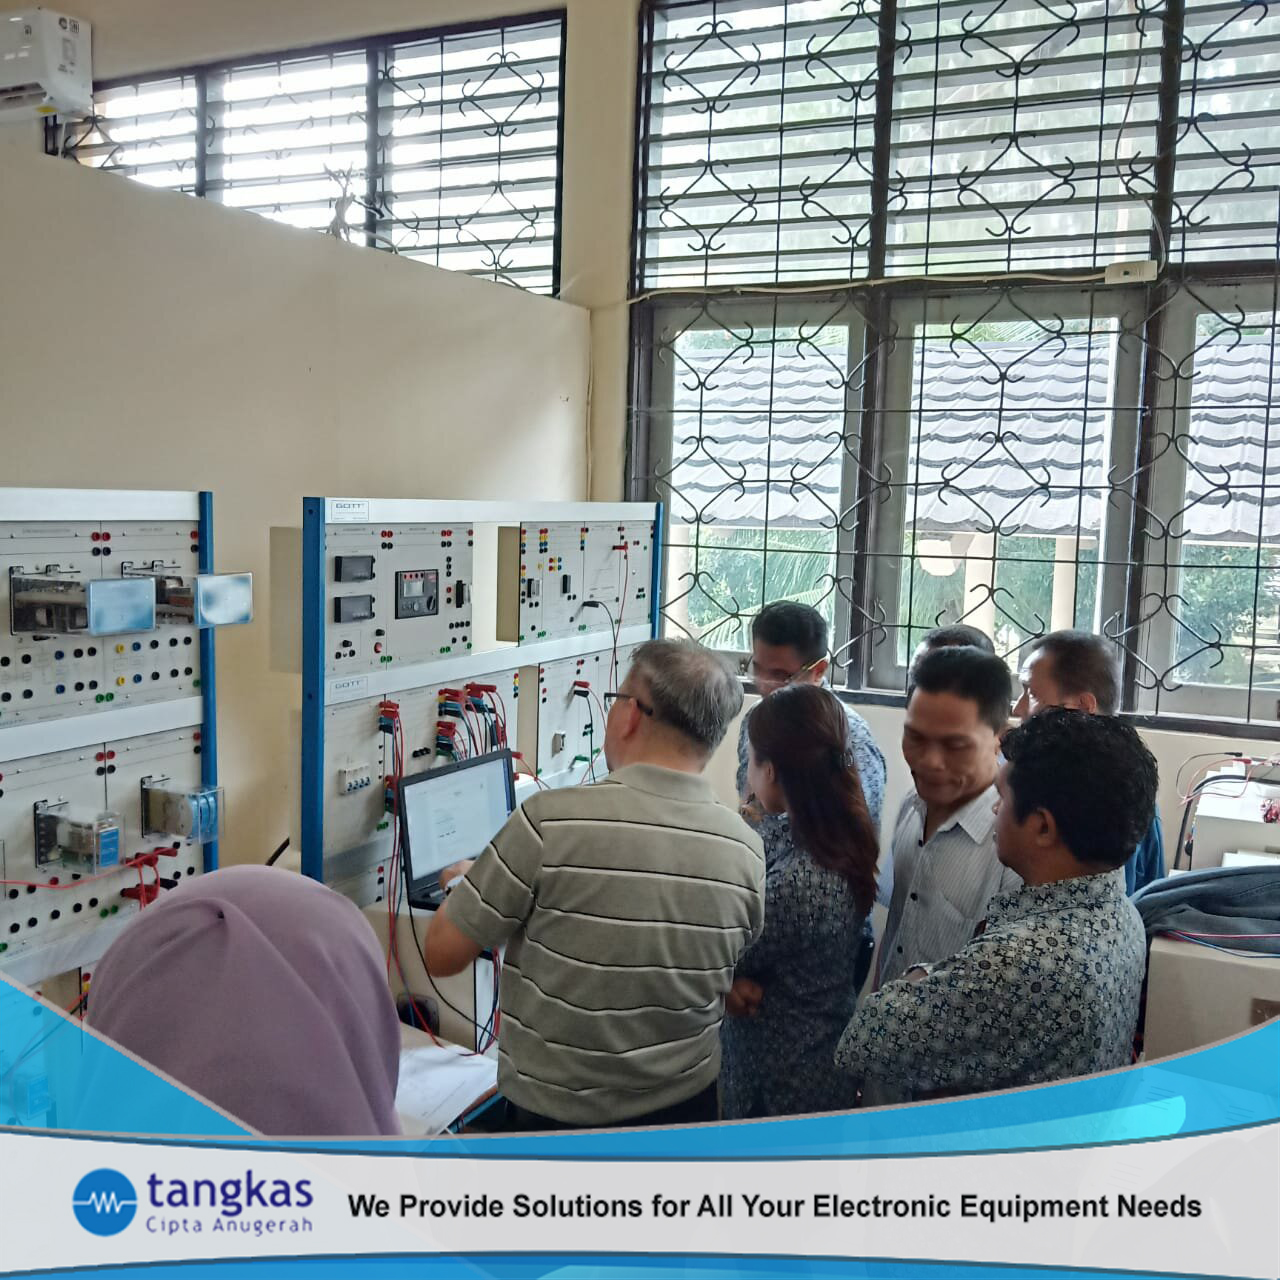 Pelatihan Electrical Transmission Training System dan Generator sets and Synchronising Board | Tangkas Cipta Anugerah